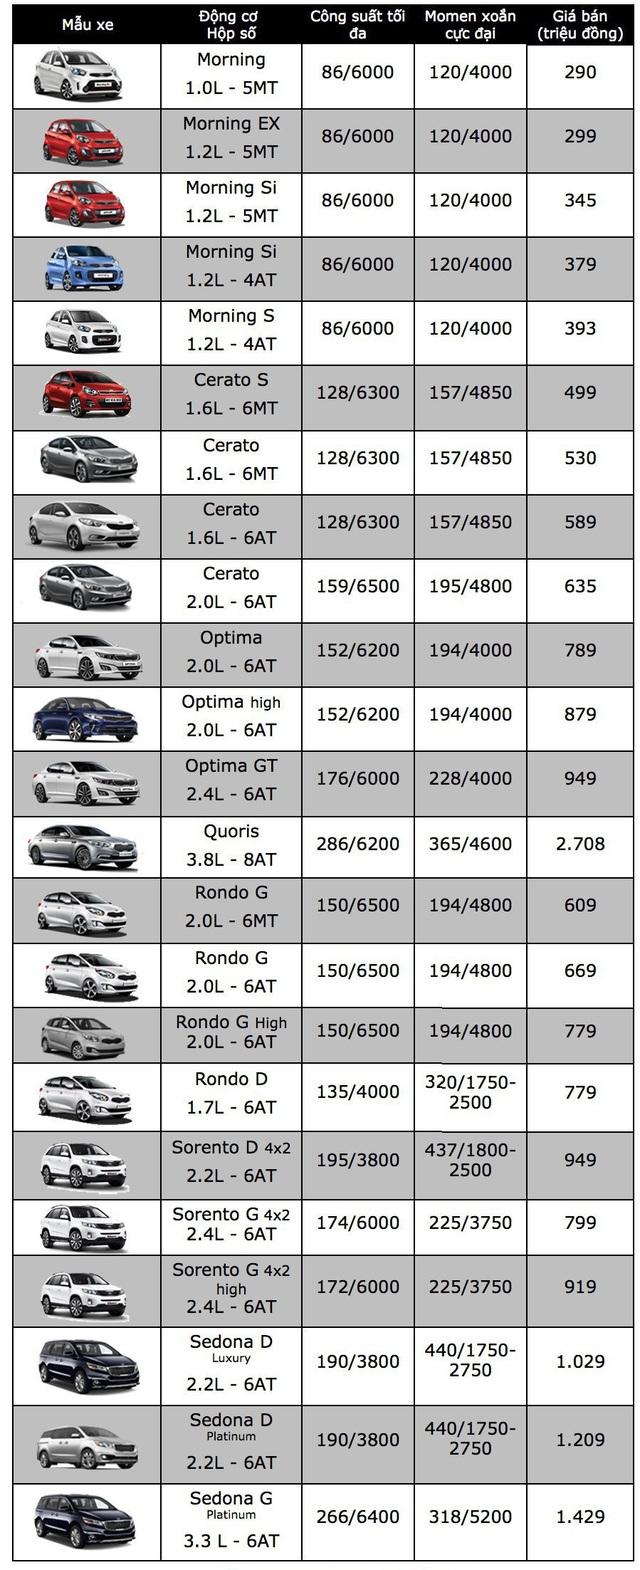 KIA Sedona tăng giá, Chevrolet Captiva hết khuyến mại - 2